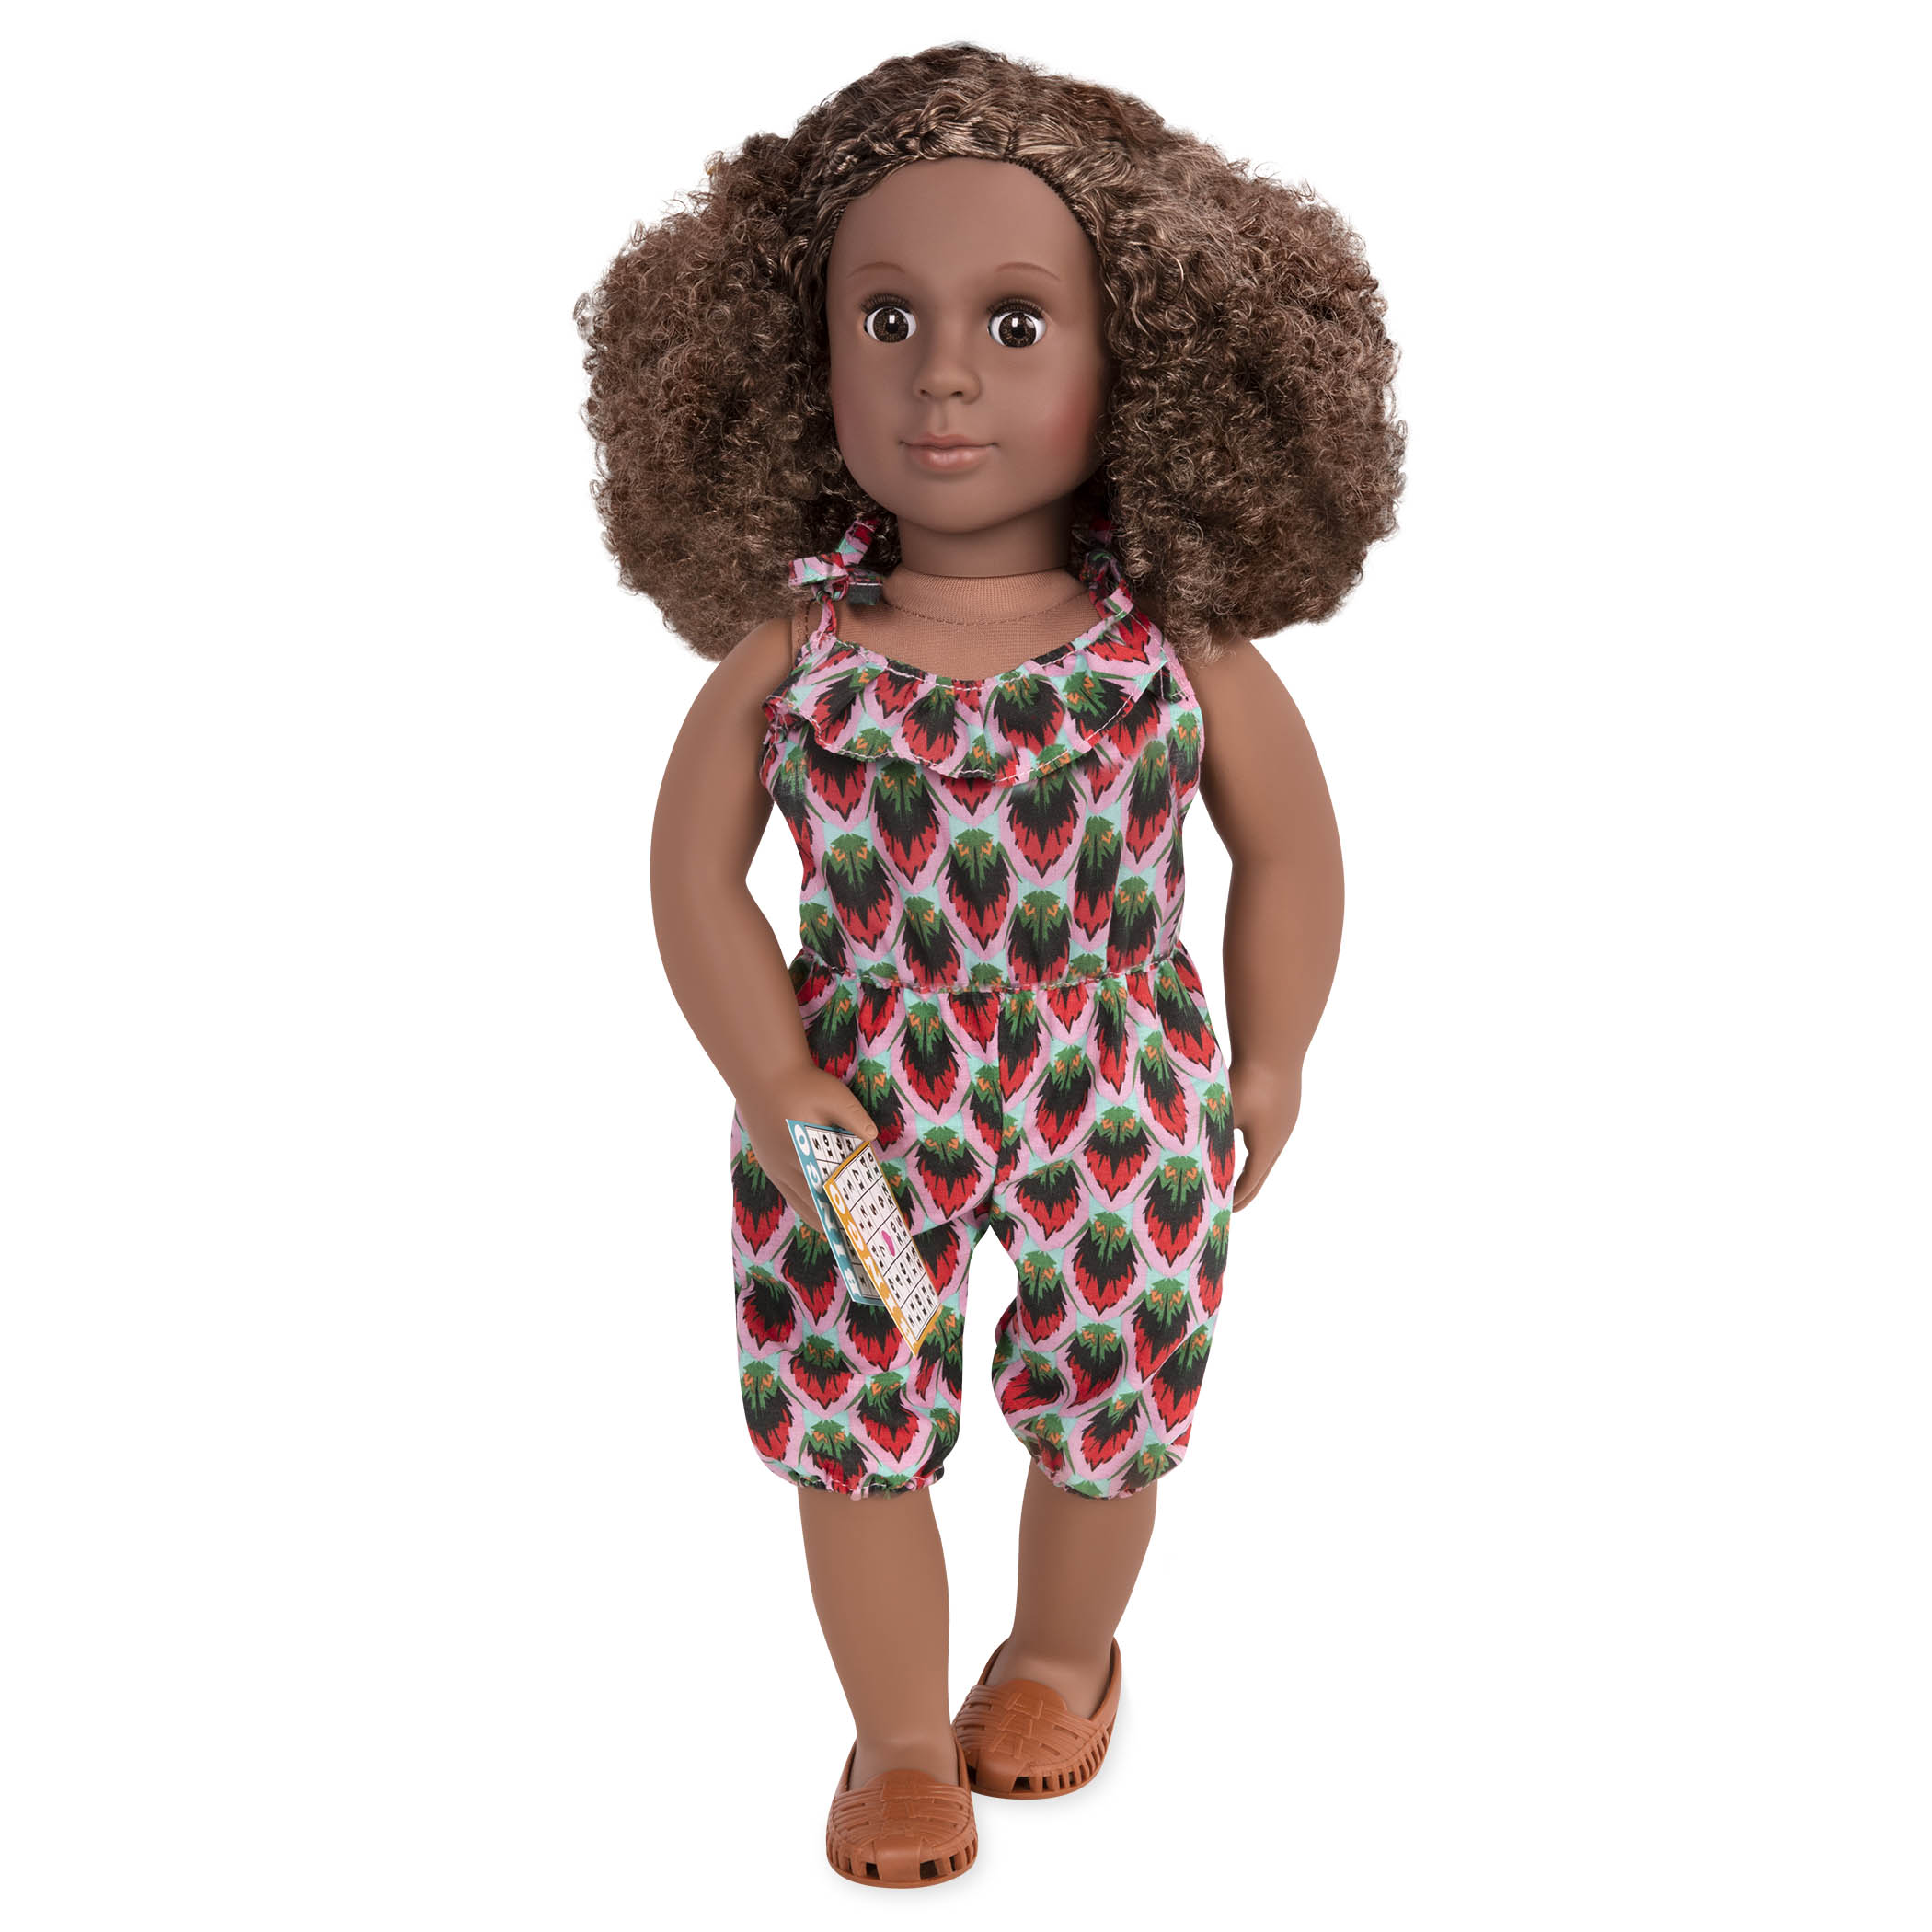 Denelle wearing sun outfit